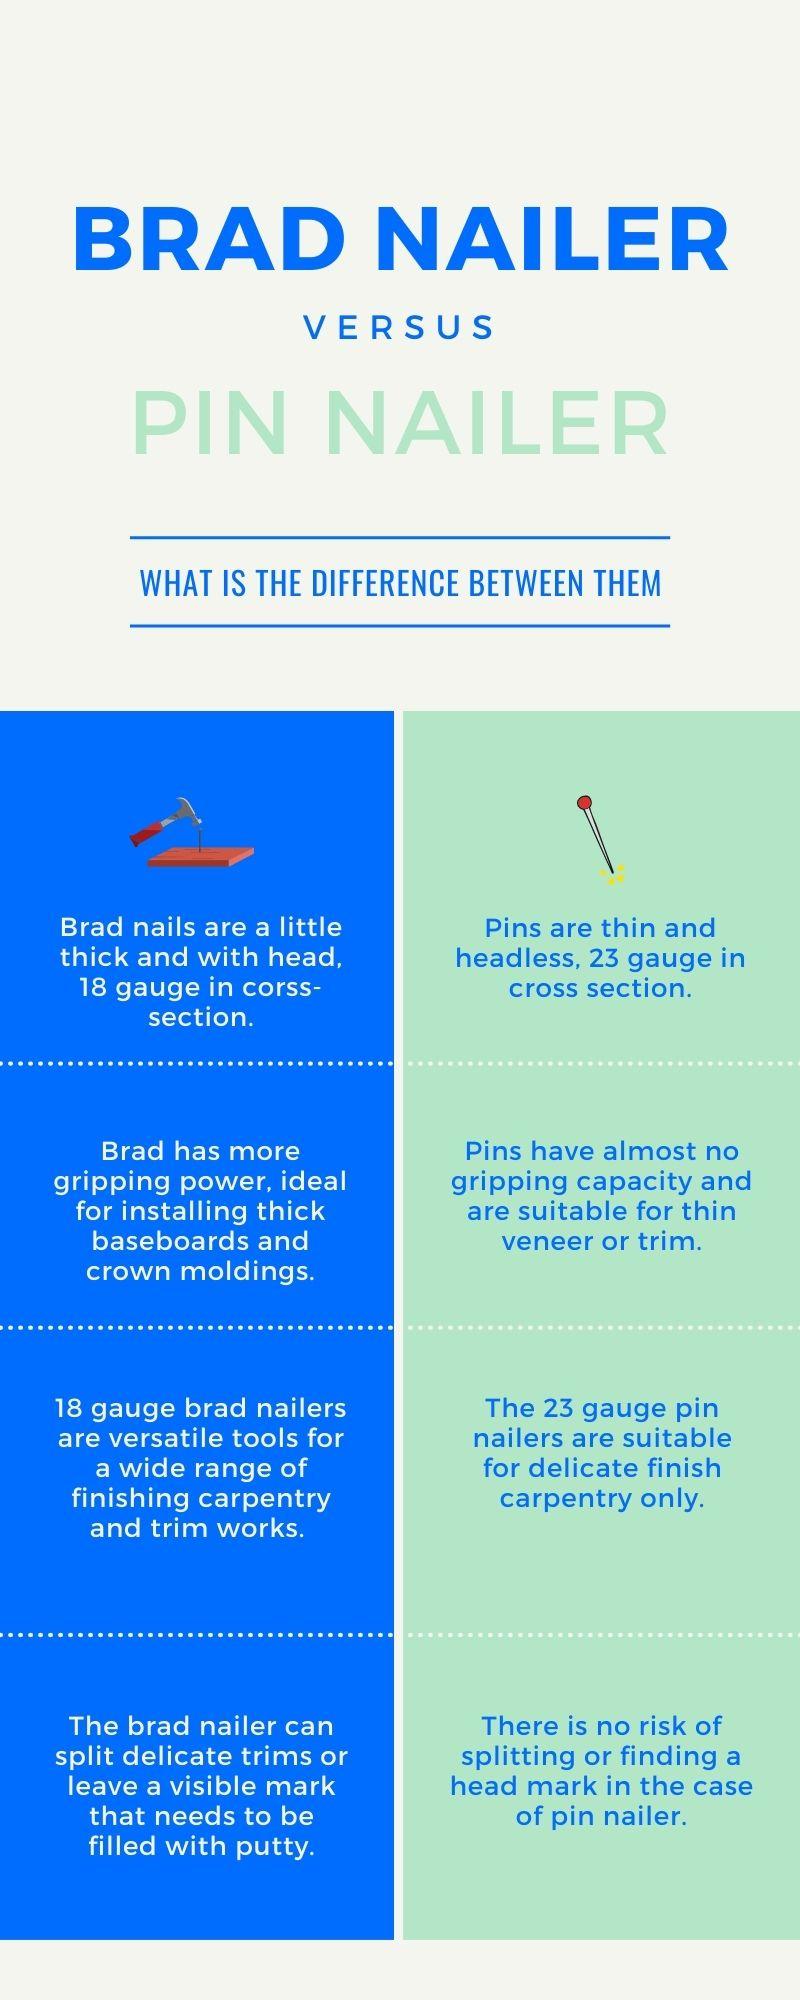 infographic on brad nailer vs pin nailer comparison